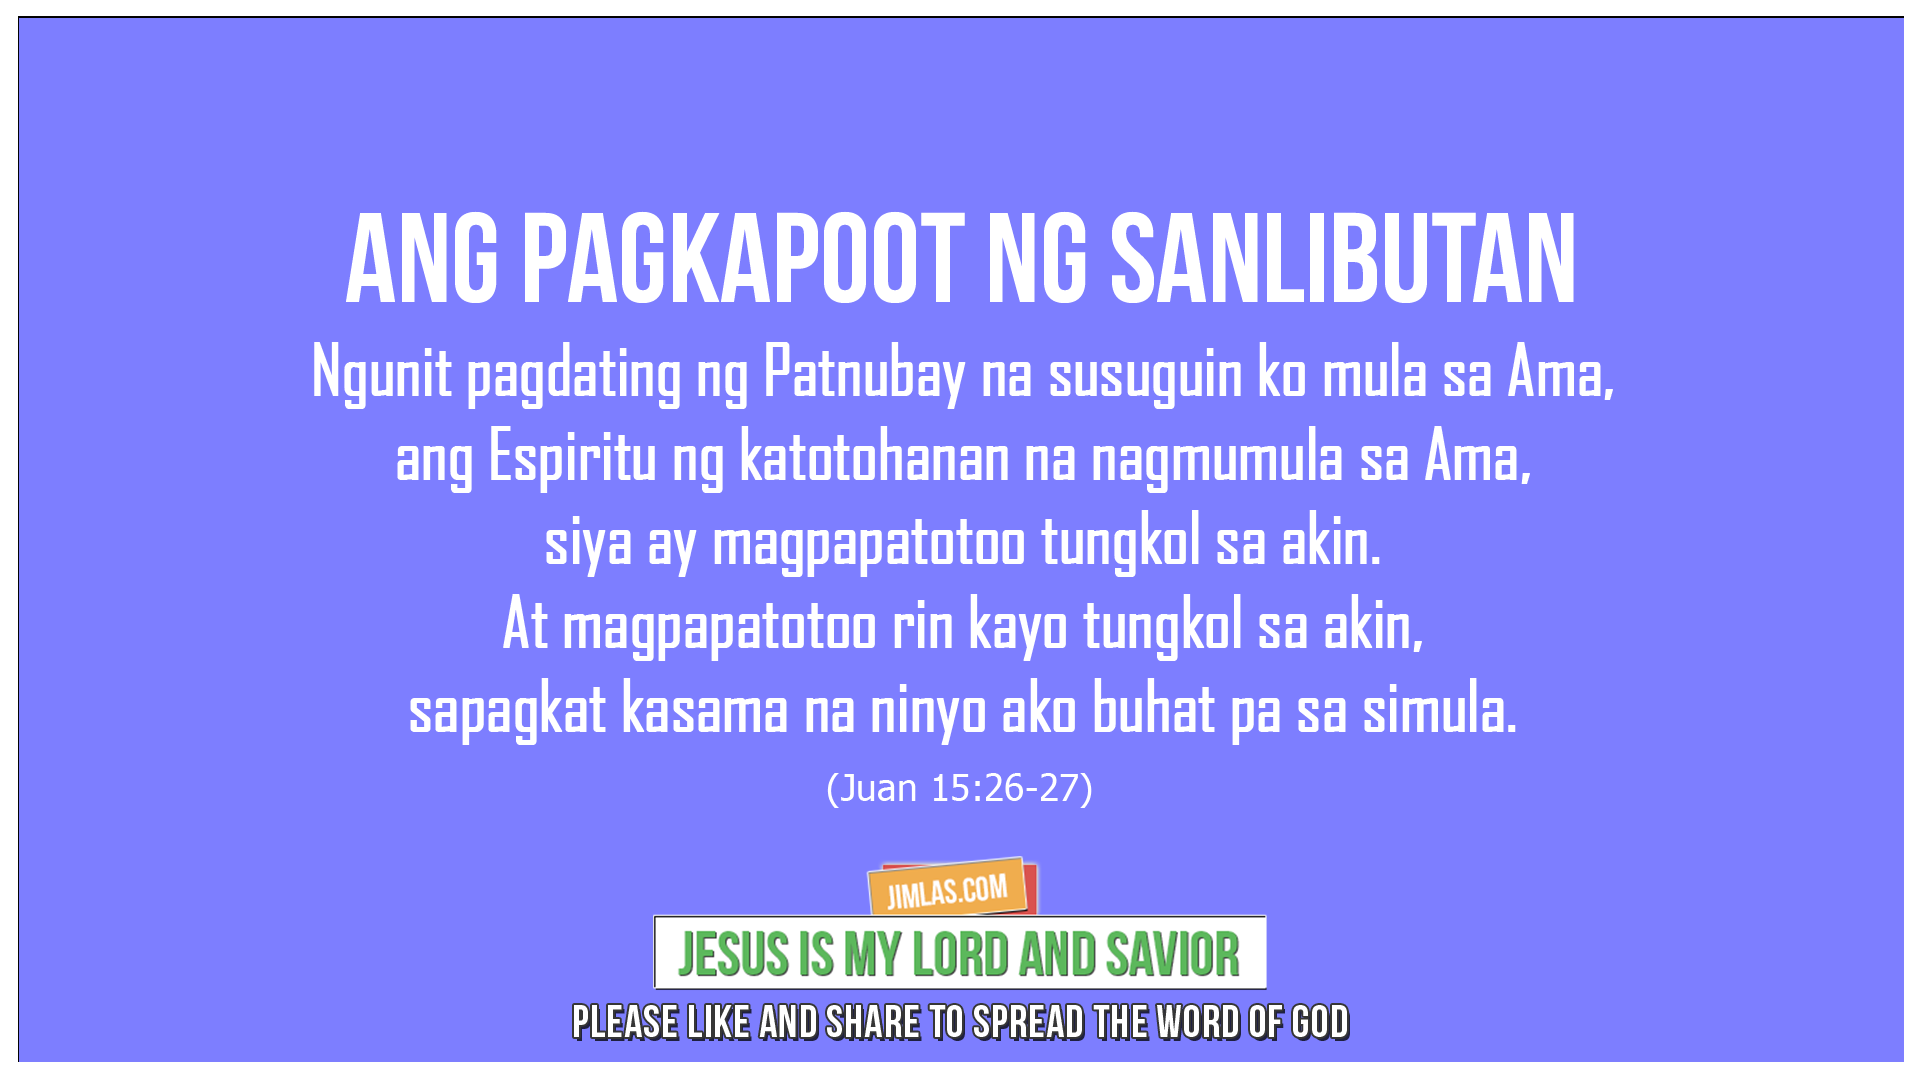 Juan 15:26-27, Juan 15:26-27